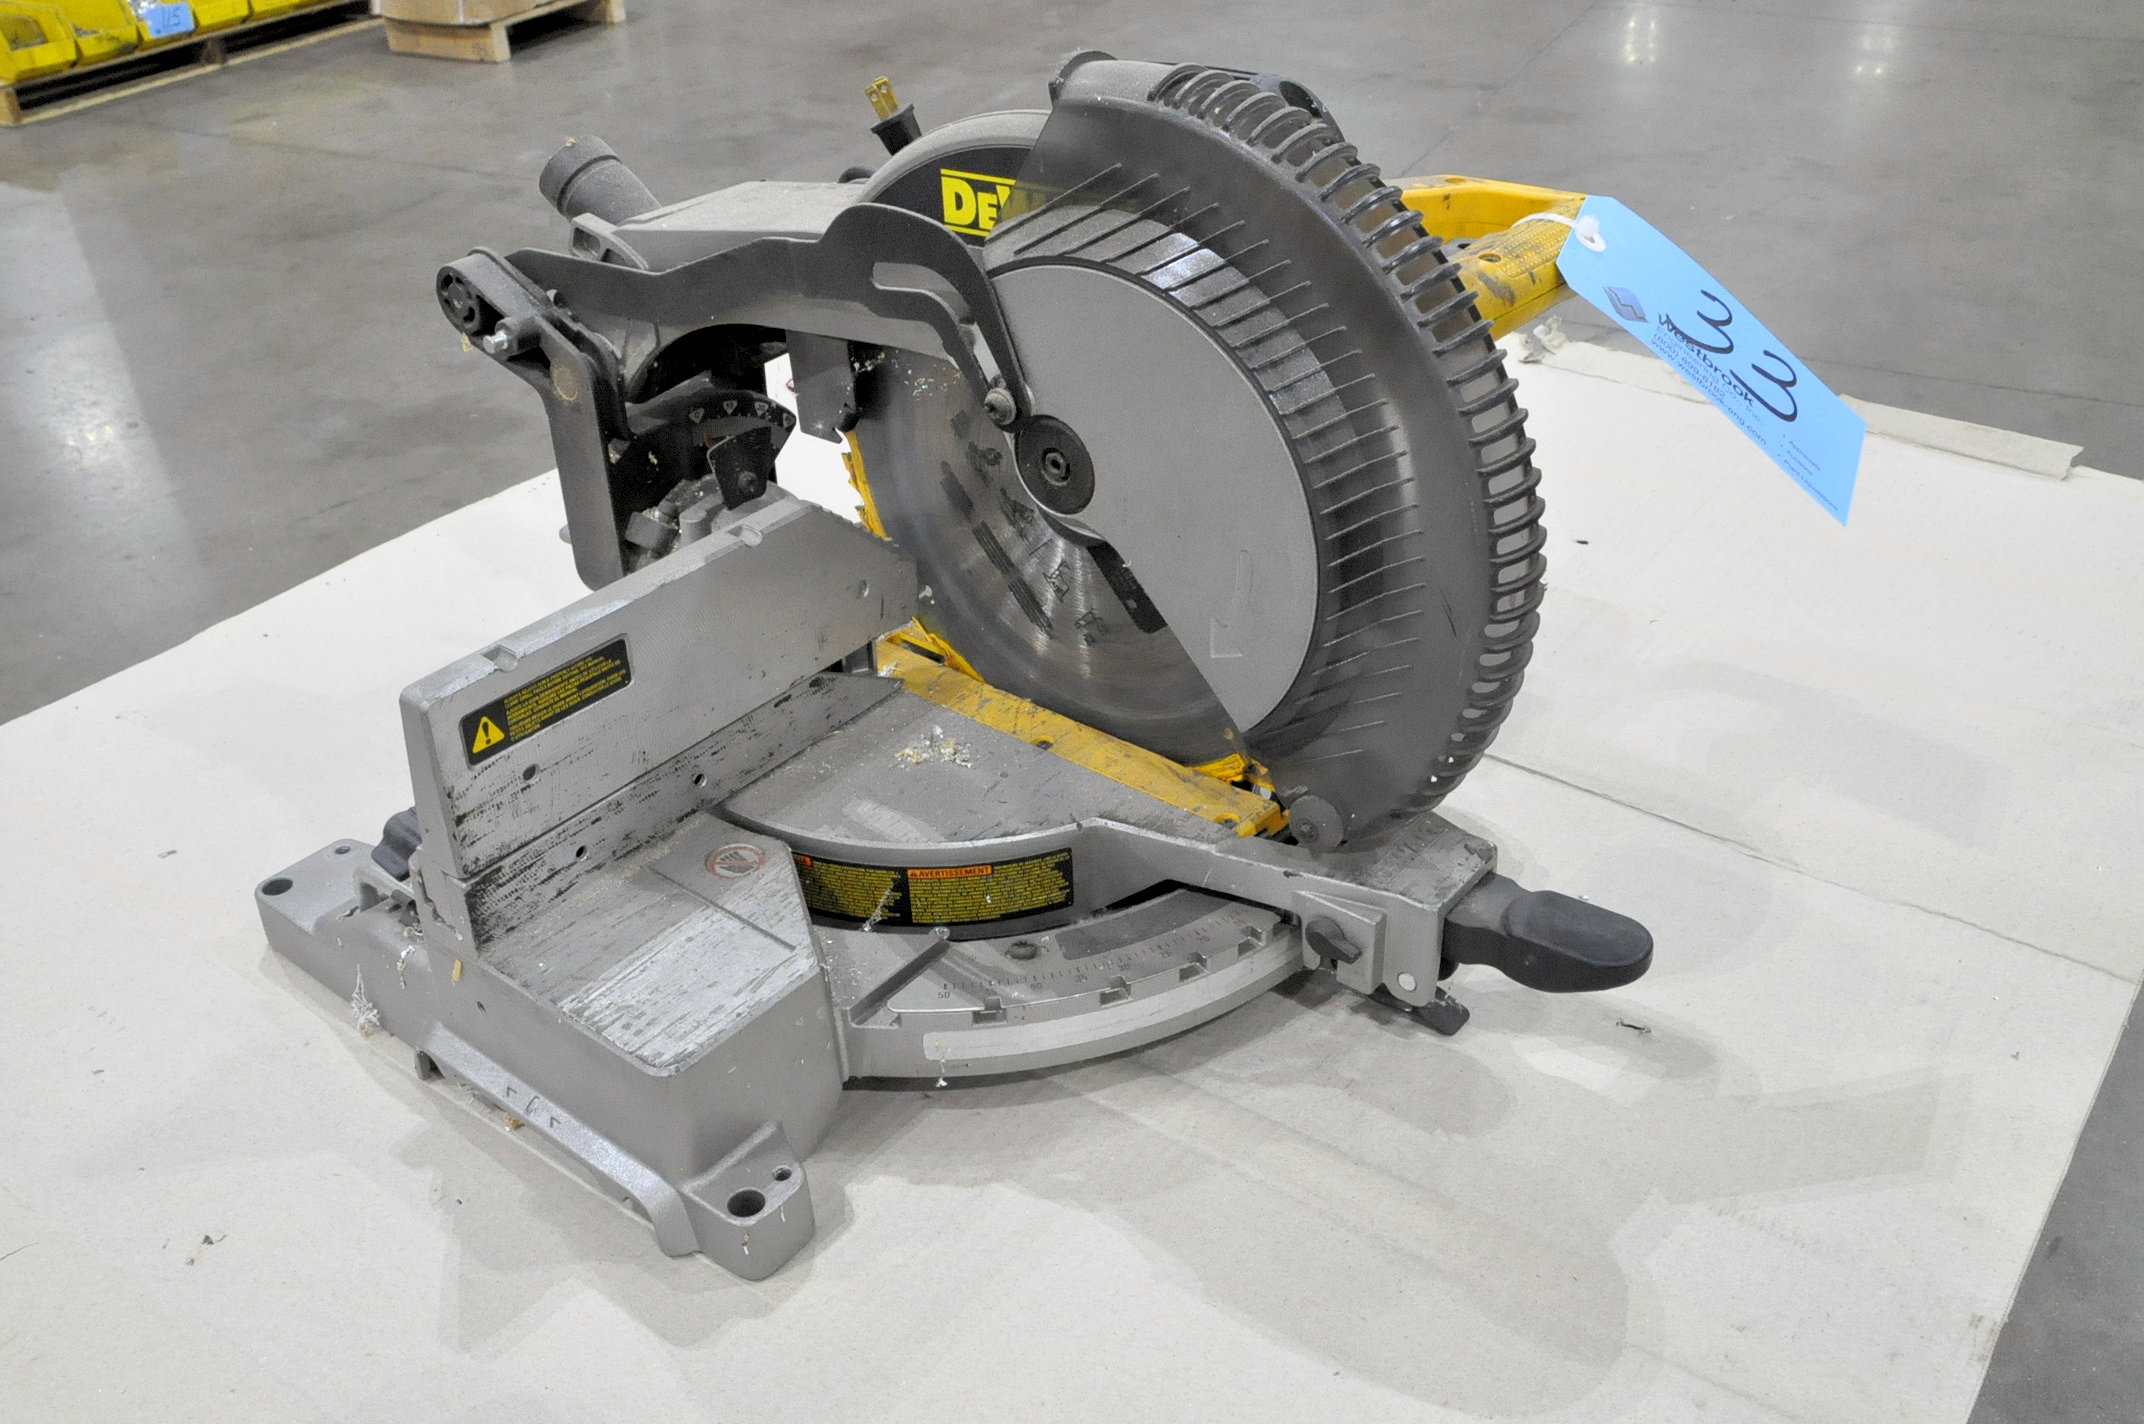 "DeWalt Model DW715, 12"" Compound Power Mitre Saw"